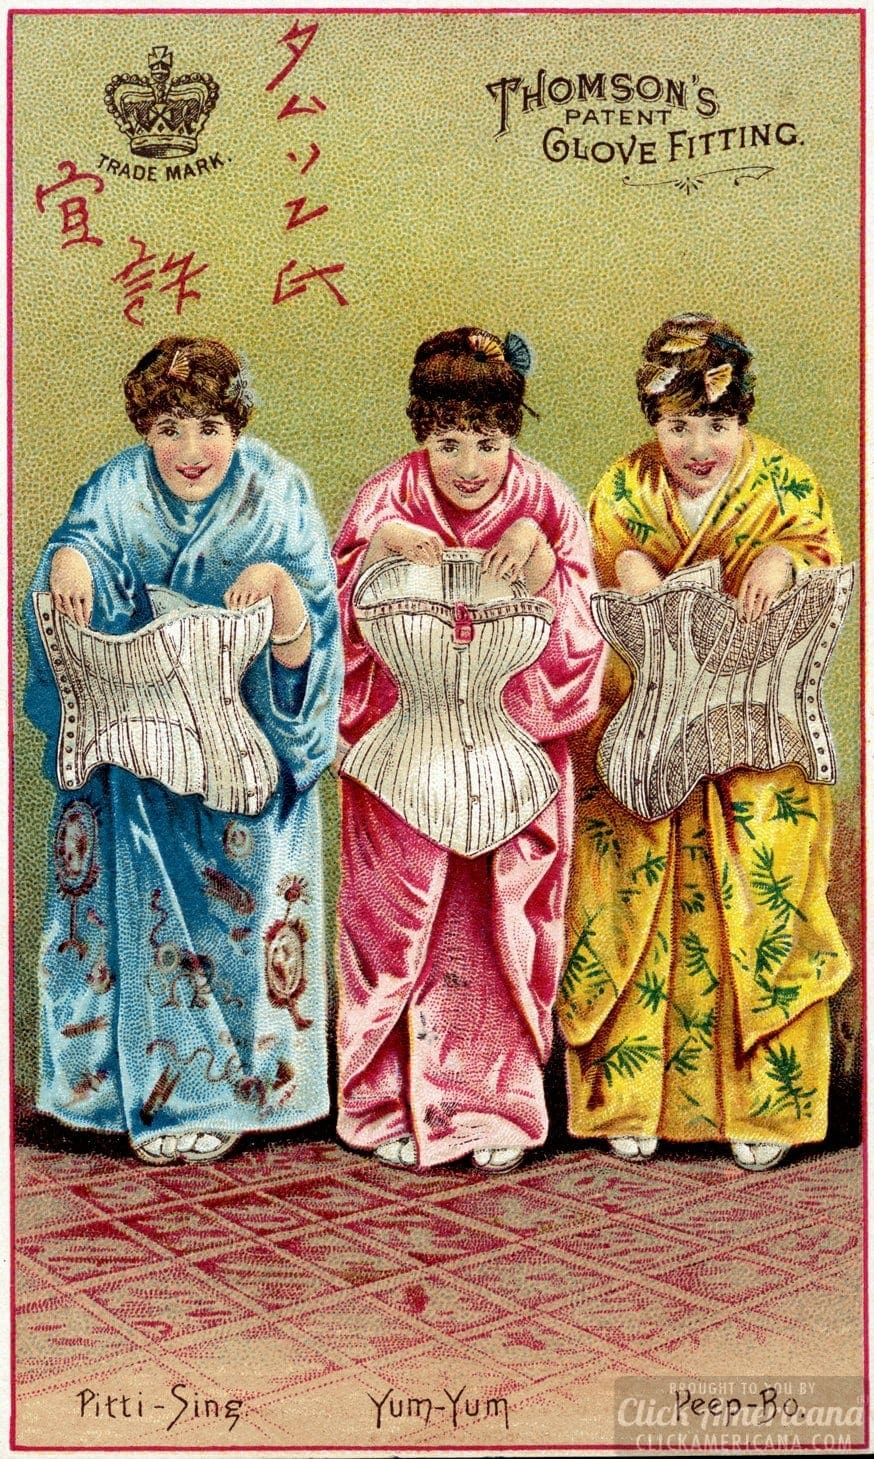 Victorian corsets - Thomson's patent glove fitting. Pitti-Sing, Yum-Yum, Peep-Bo